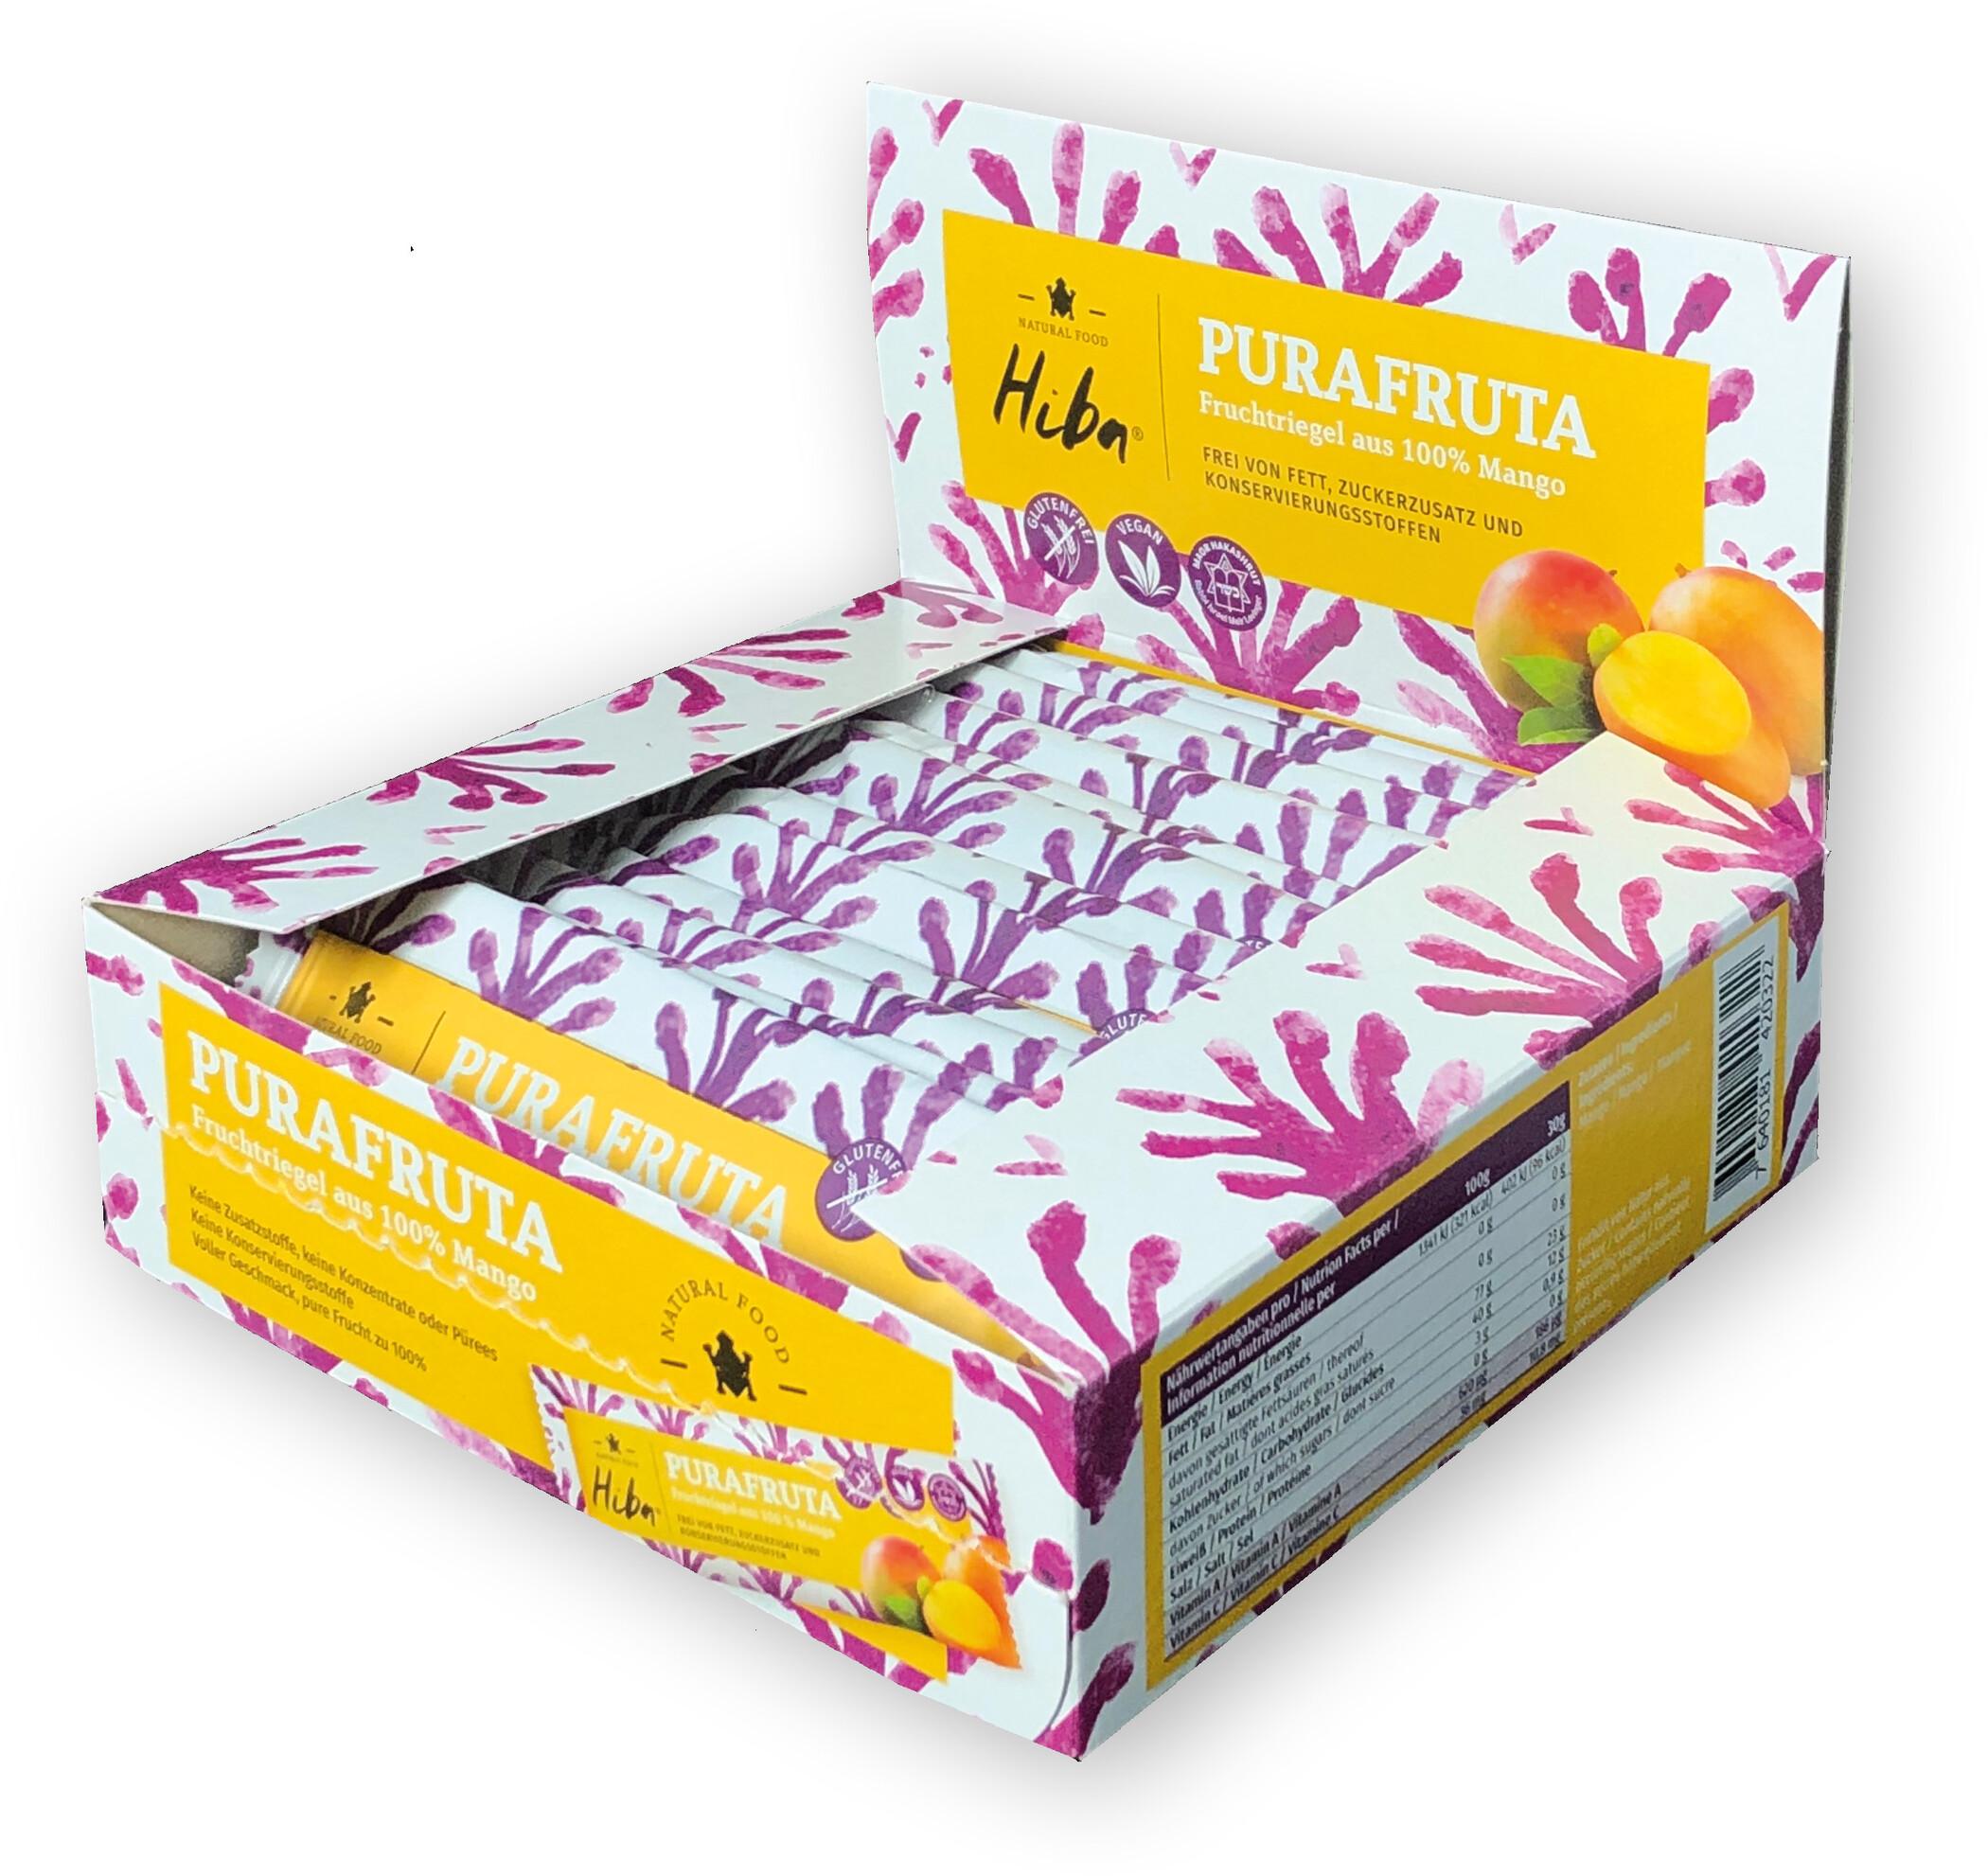 Hiba Purafruta Energy Bar Box 12x30g, Mango (2019) | Energy bar